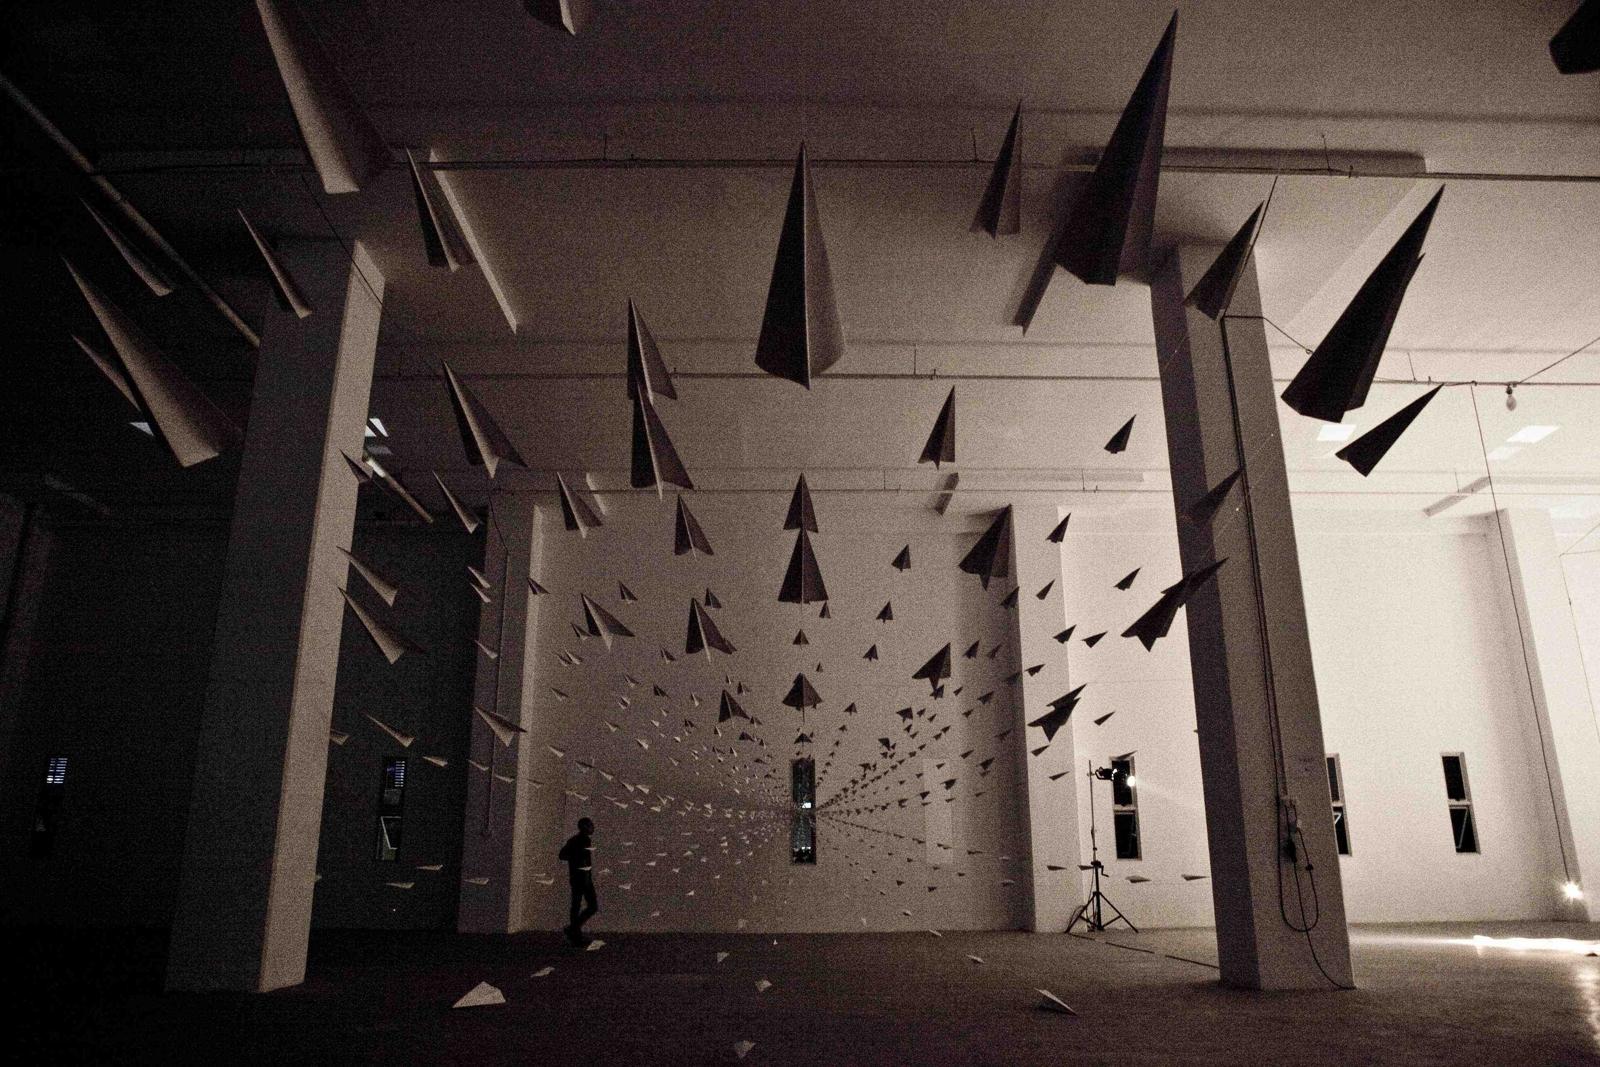 Paper Planes 3 image